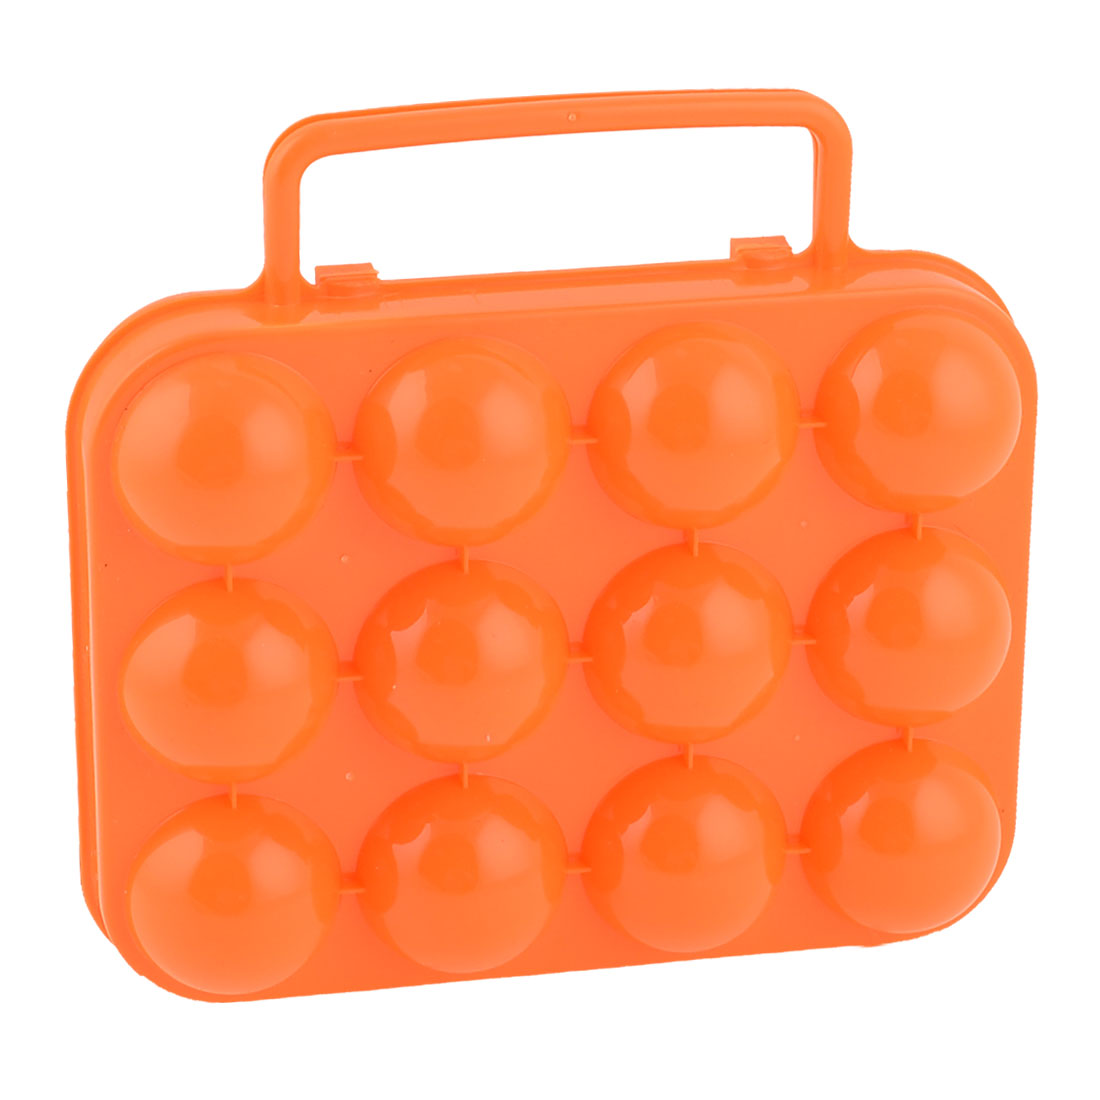 Picnic Camping Orange Plastic Foldable Storage Case 12 Eggs Holder Carrier